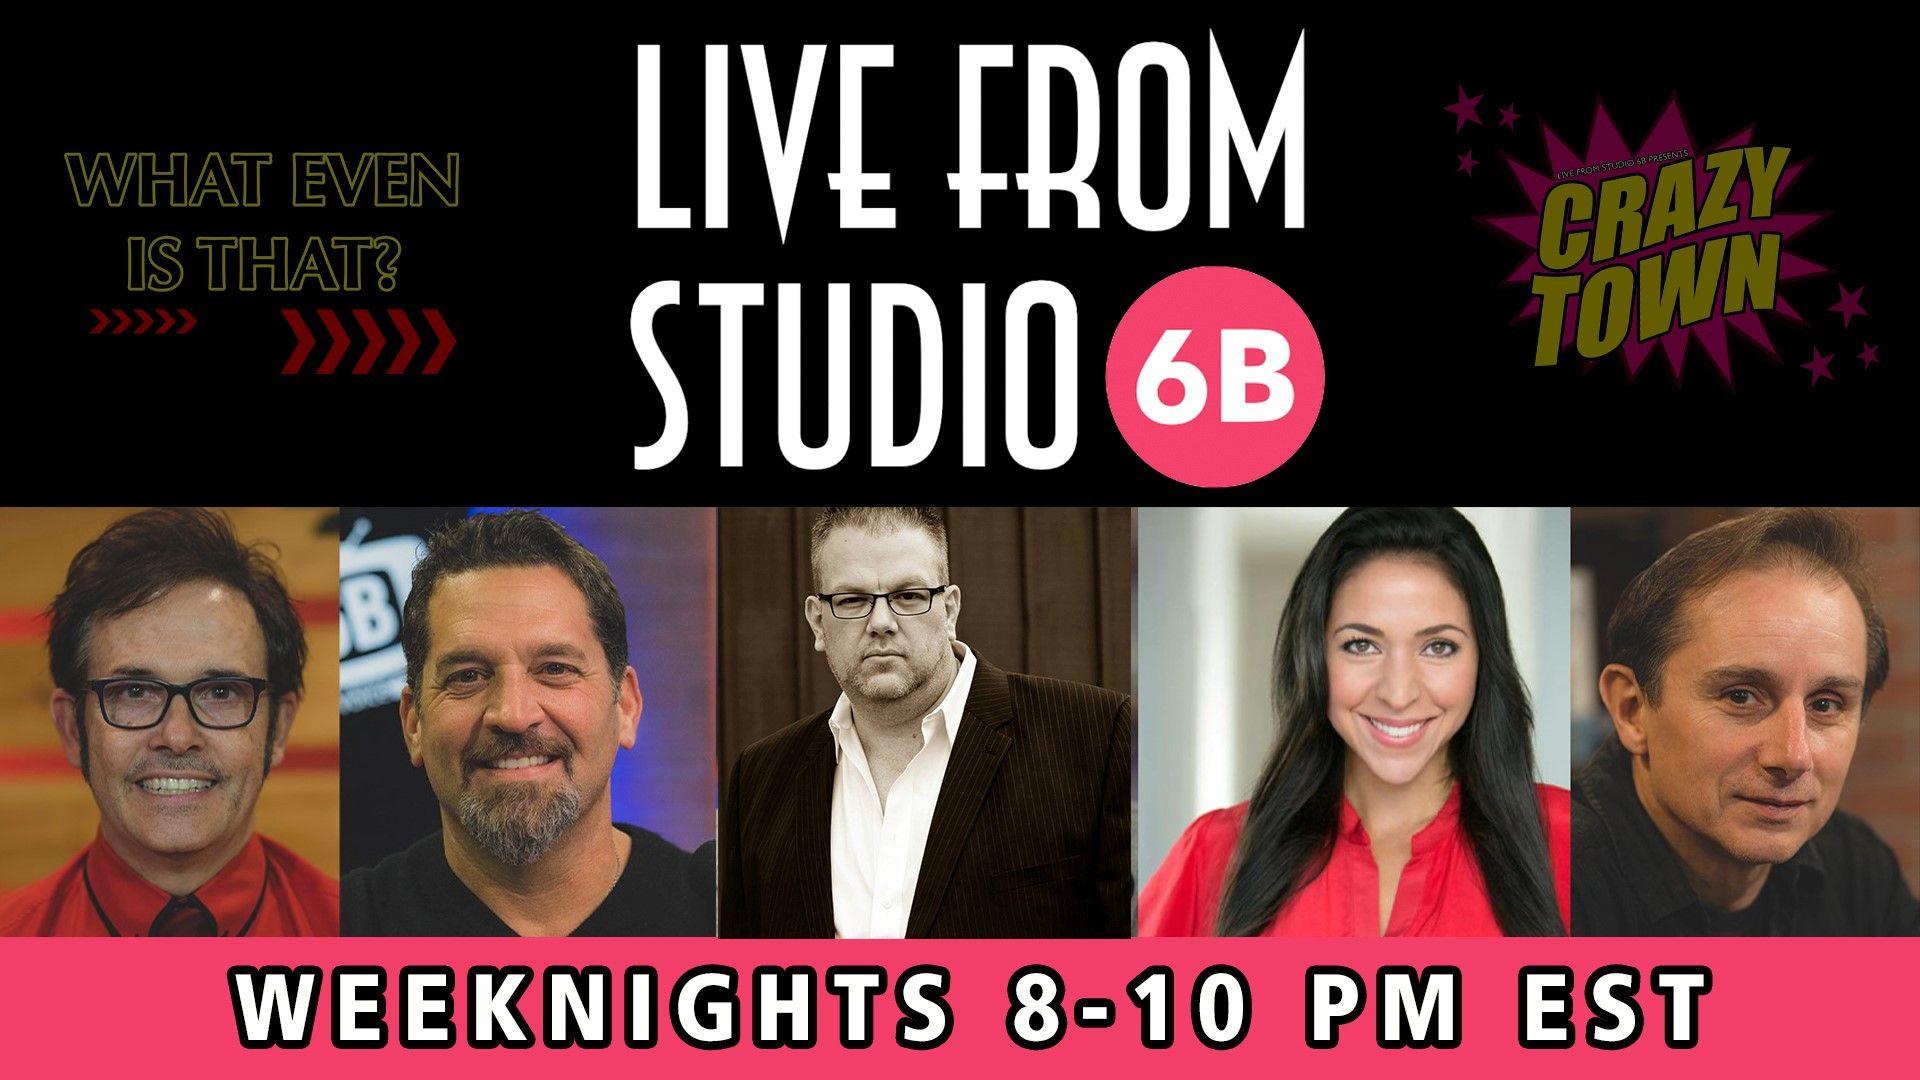 Live From Studio 6B